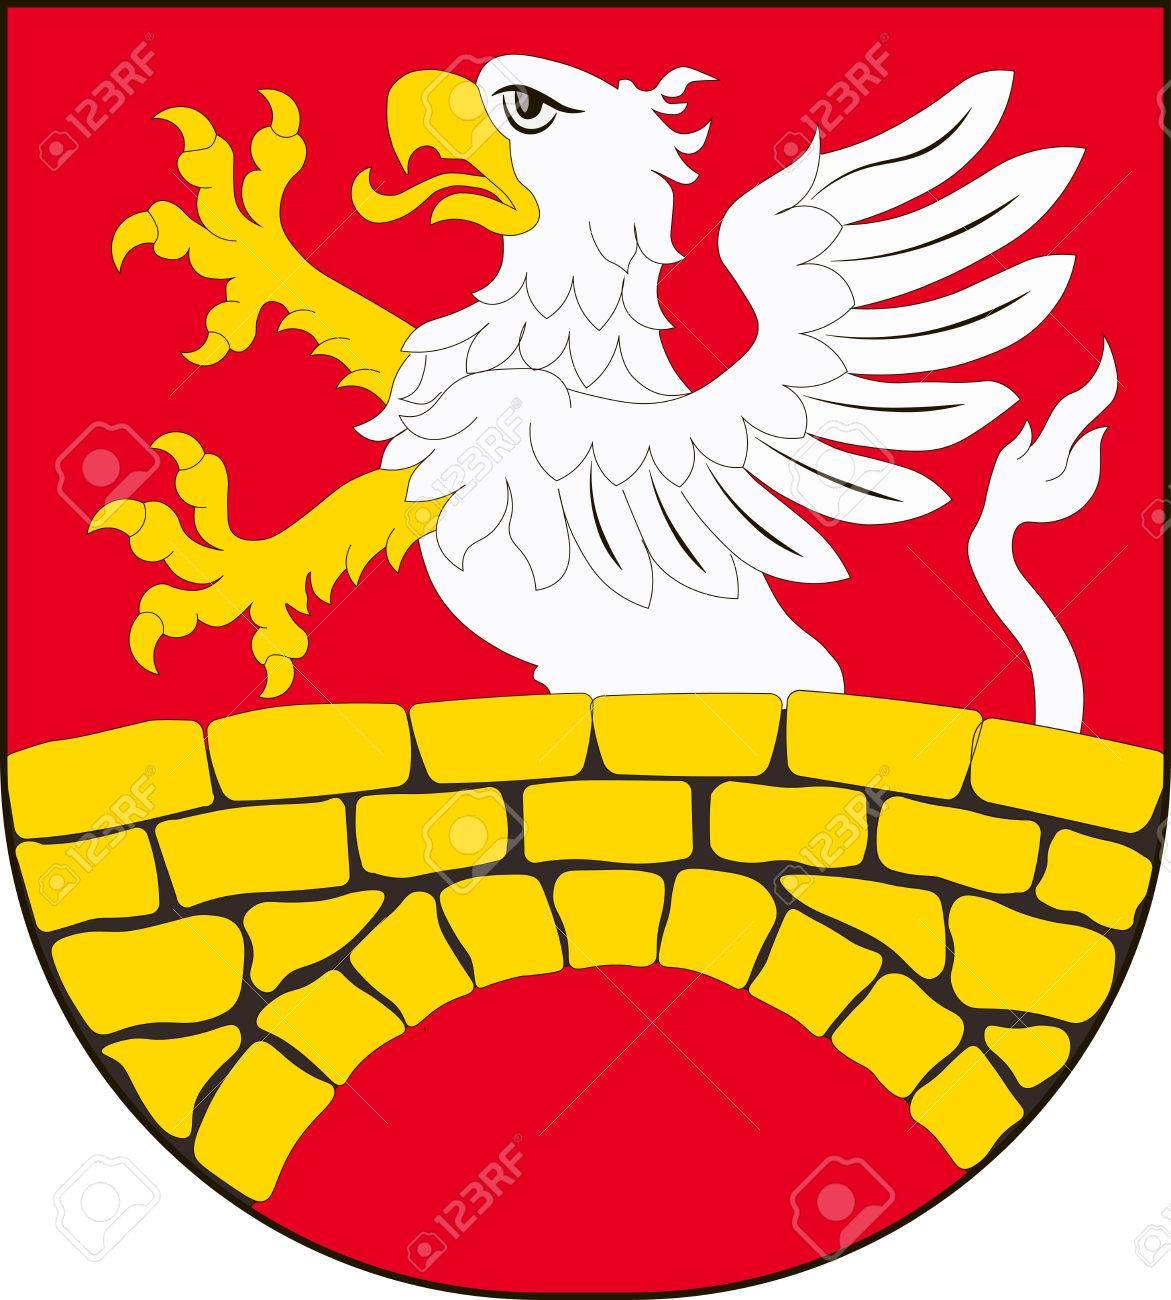 Gmina ザモシチの国章は、ポーラ...